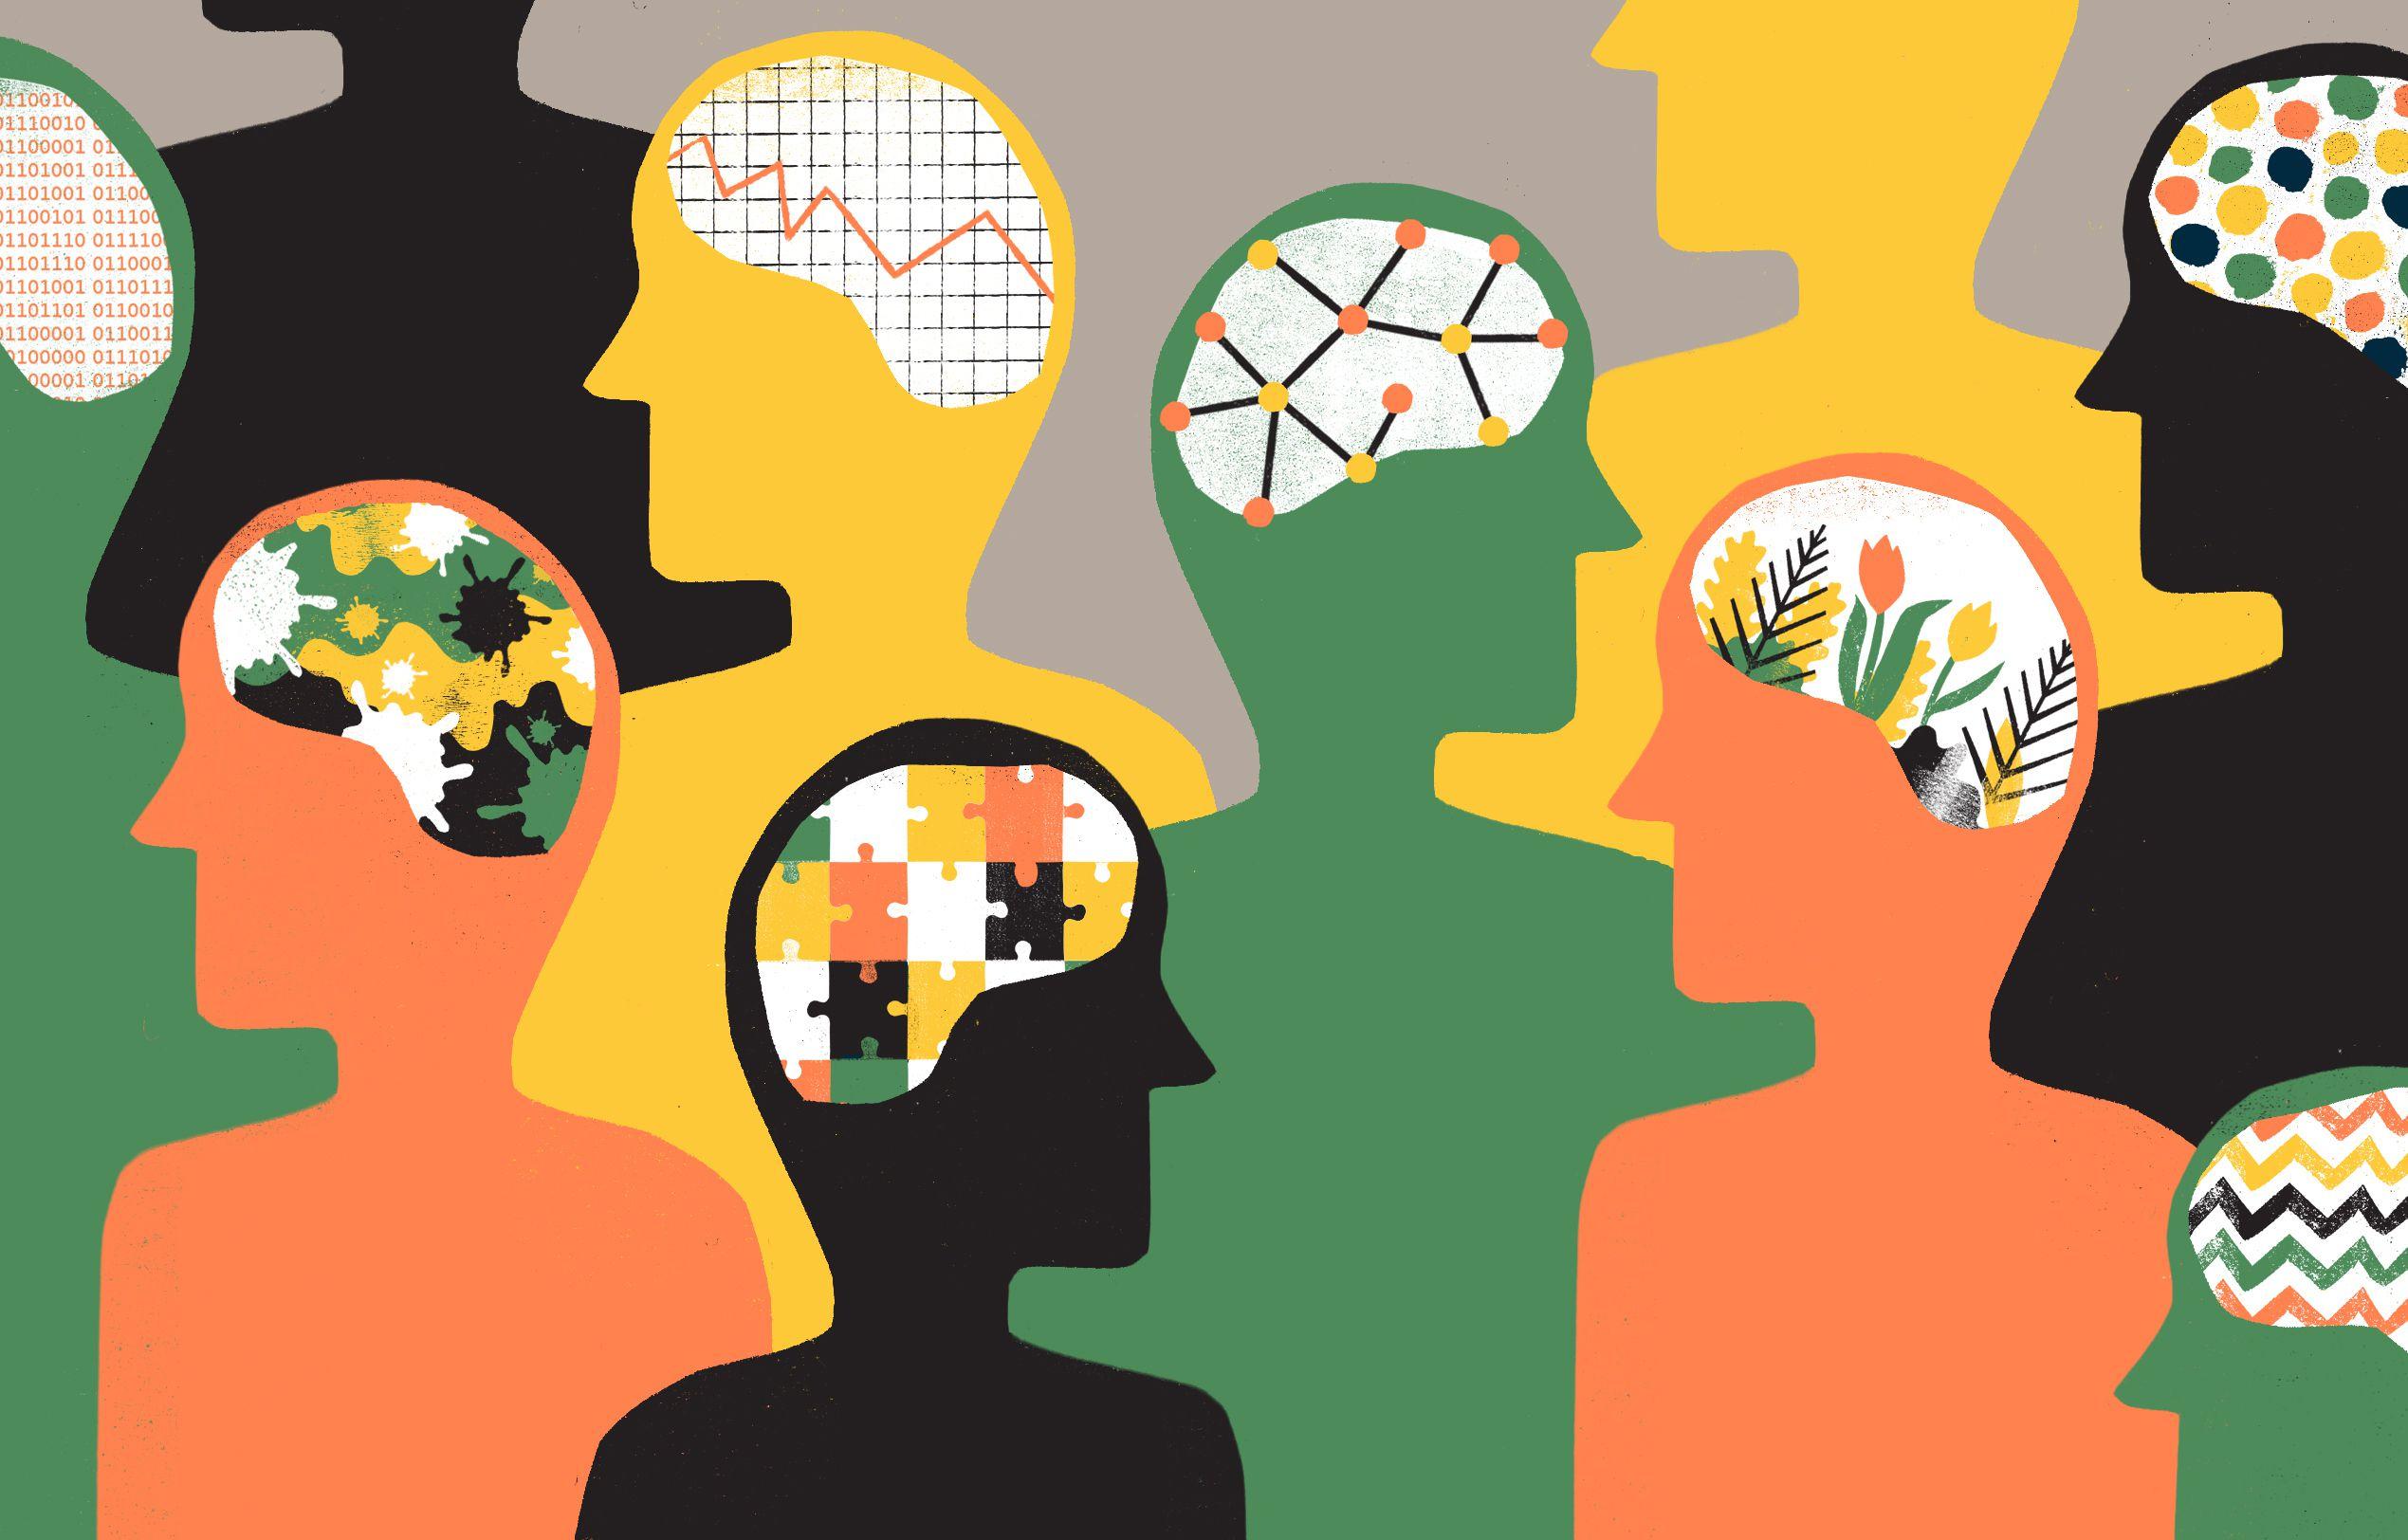 The major goals of. Psychology clipart mind control